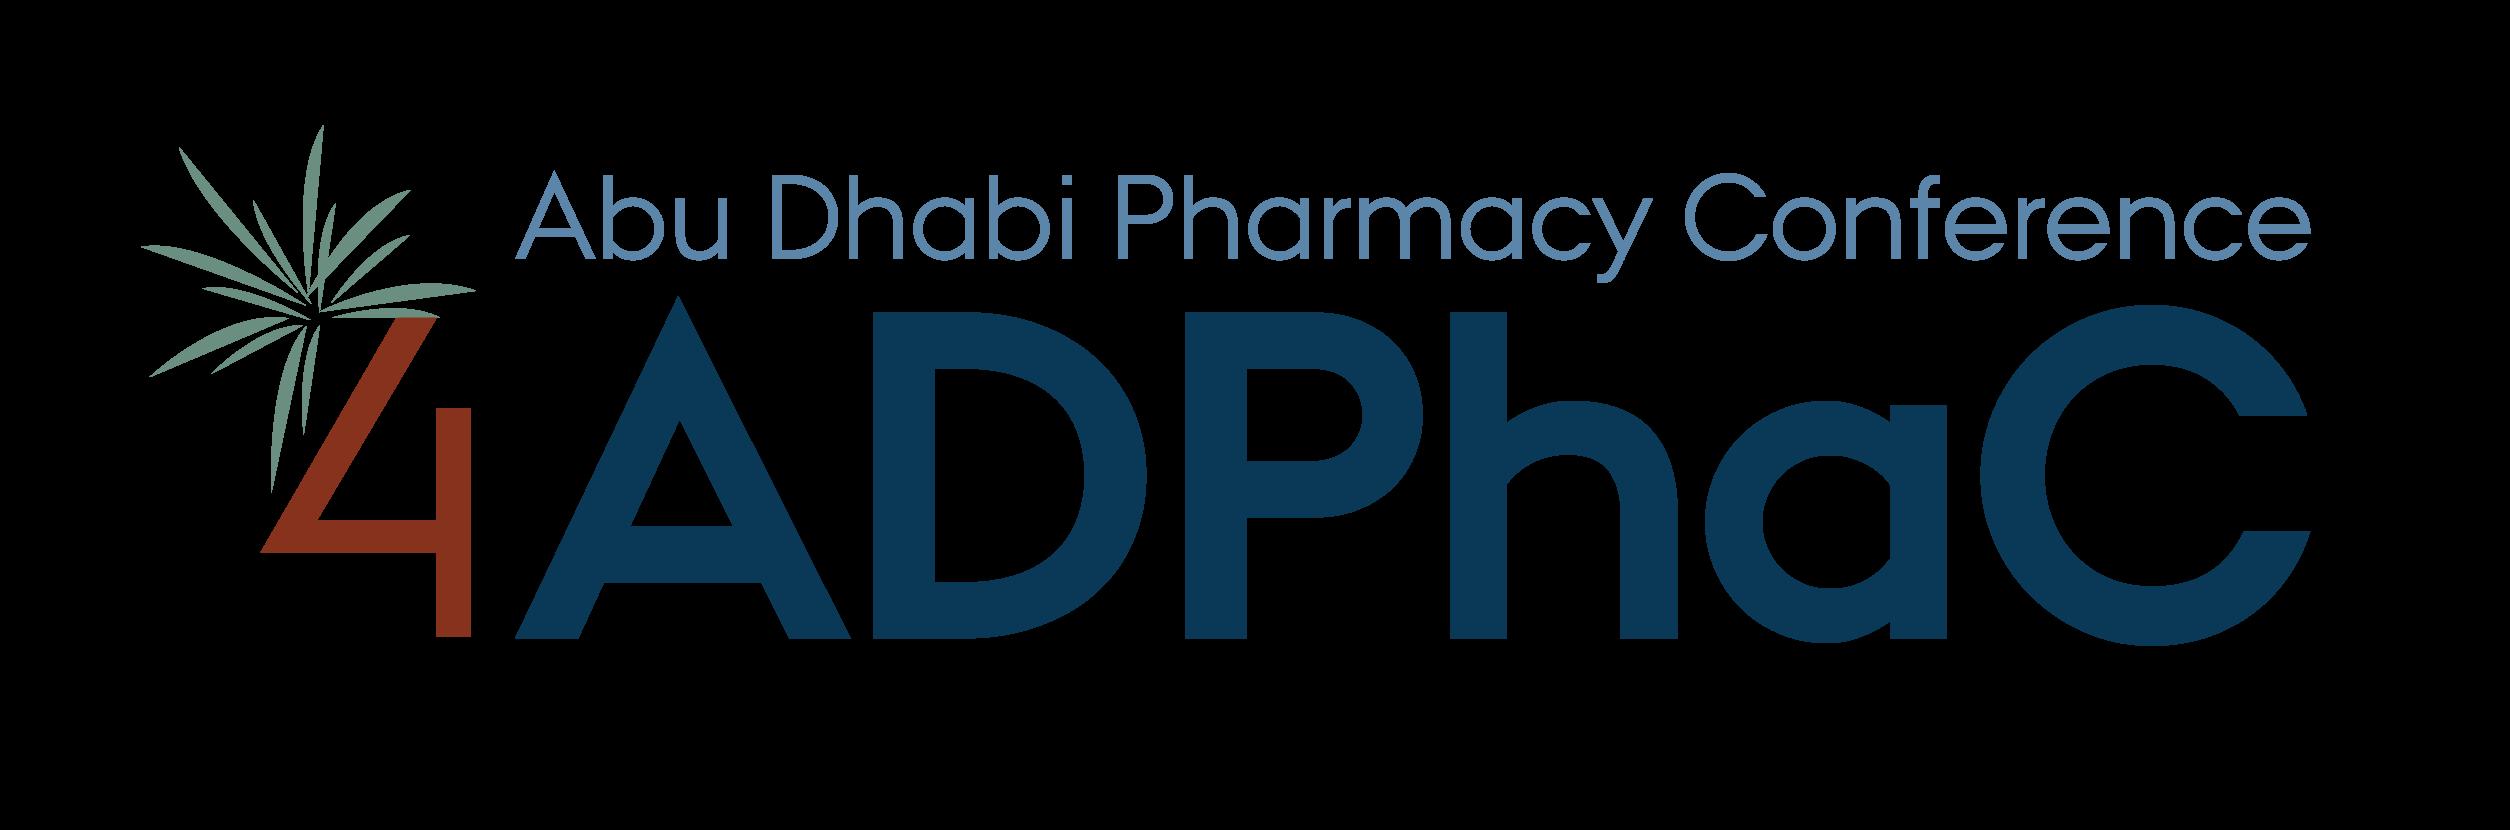 4th Abu Dhabi Pharmacy Conference (ADPhaC) - Jumeirah at Etihad Towers Abu Dhabi West Corniche – Abu Dhabi, UAE